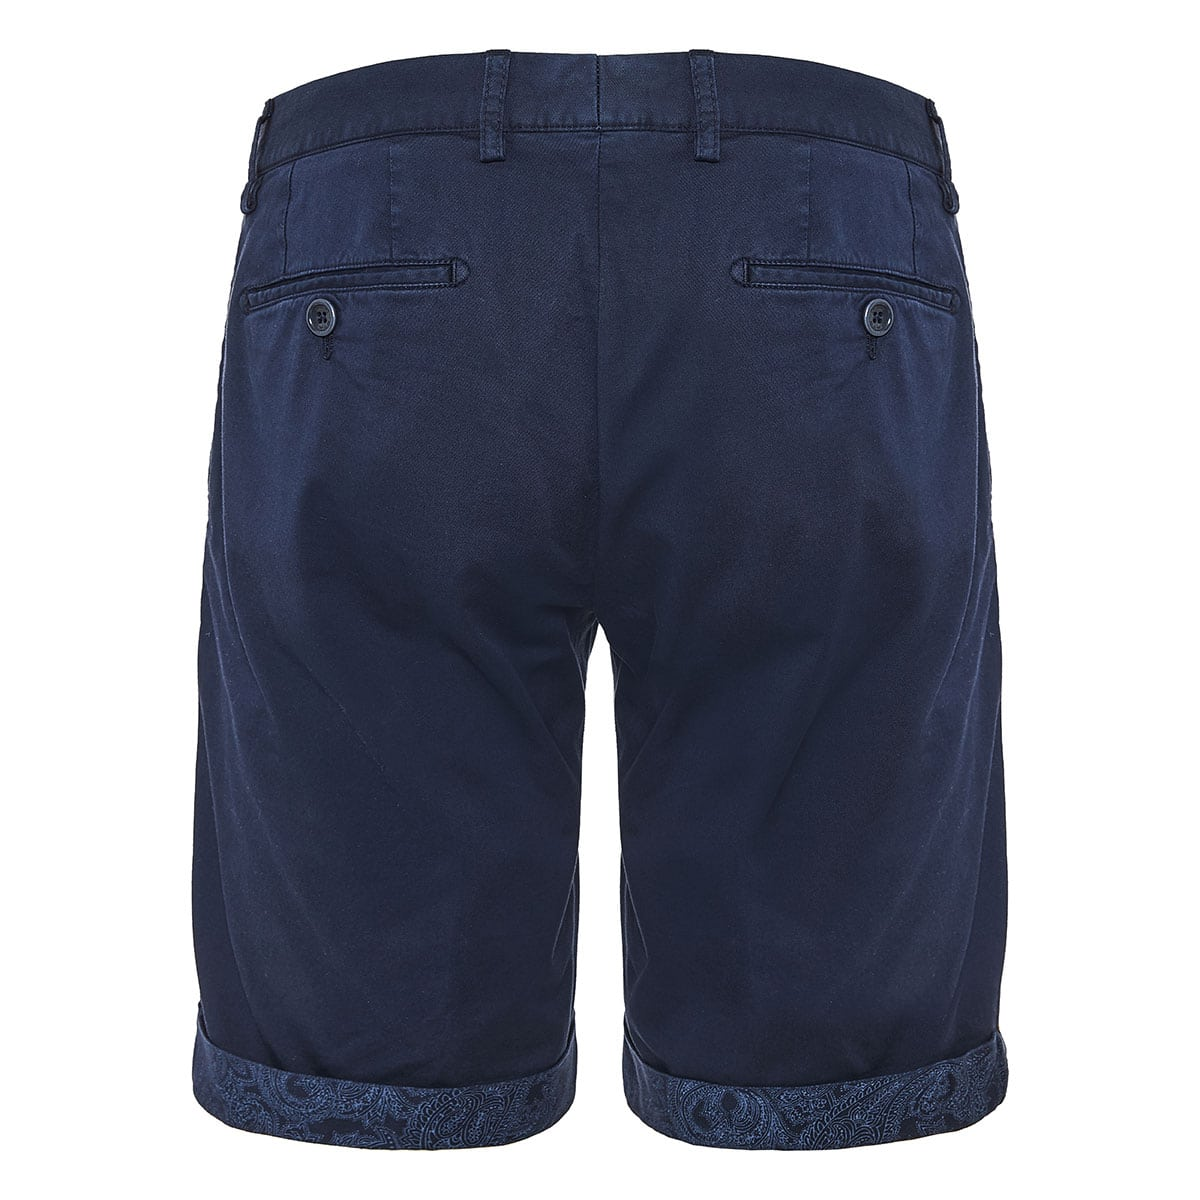 Bermuda shorts with paisley hems